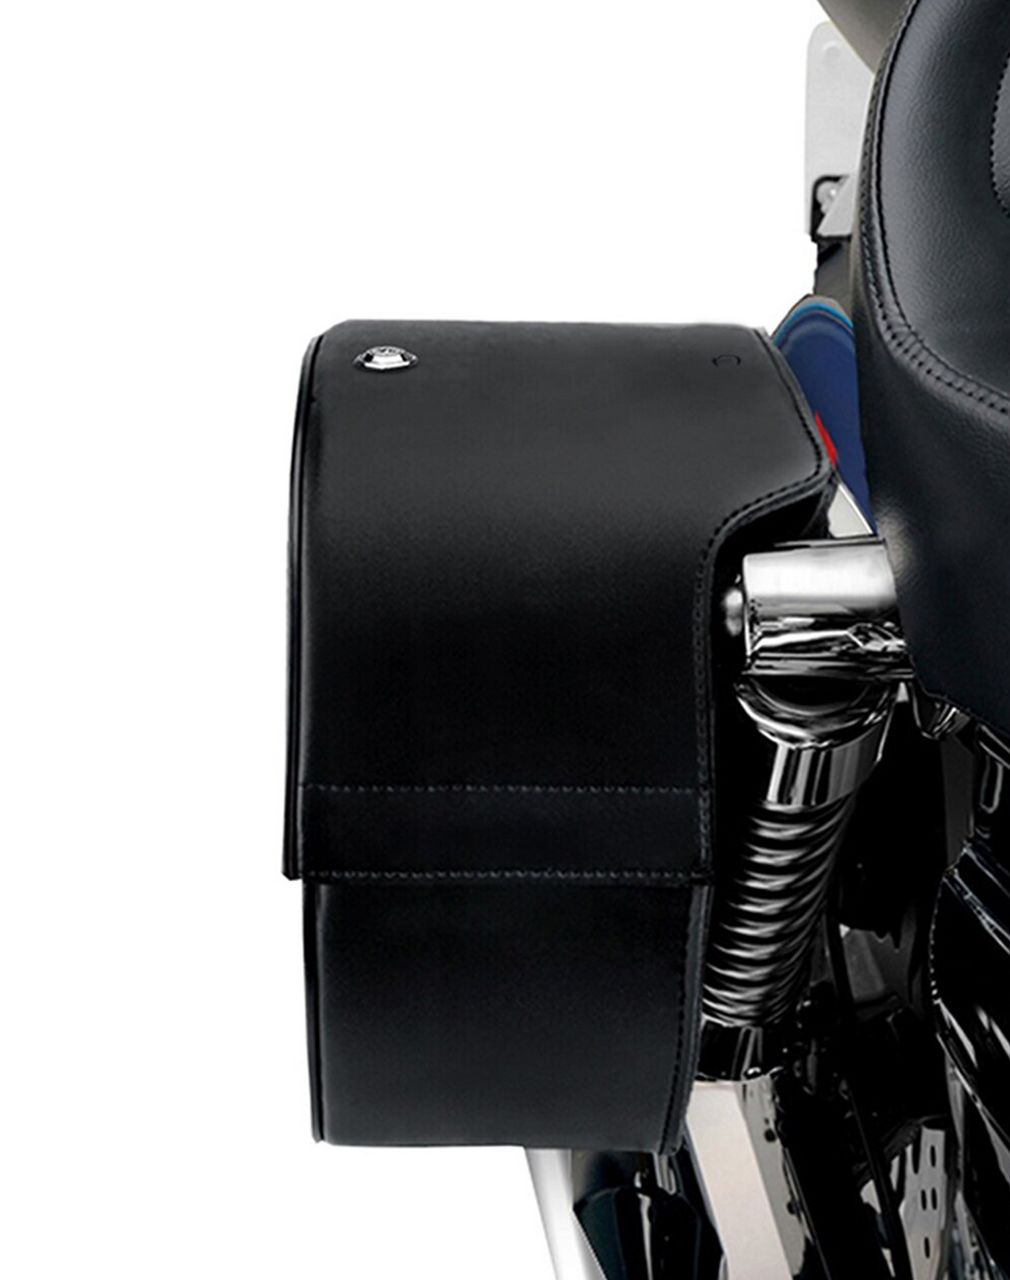 Honda Rebel 500 Shock Shock Cutout Slanted Large Motorcycle Saddlebags Shock Cutout View